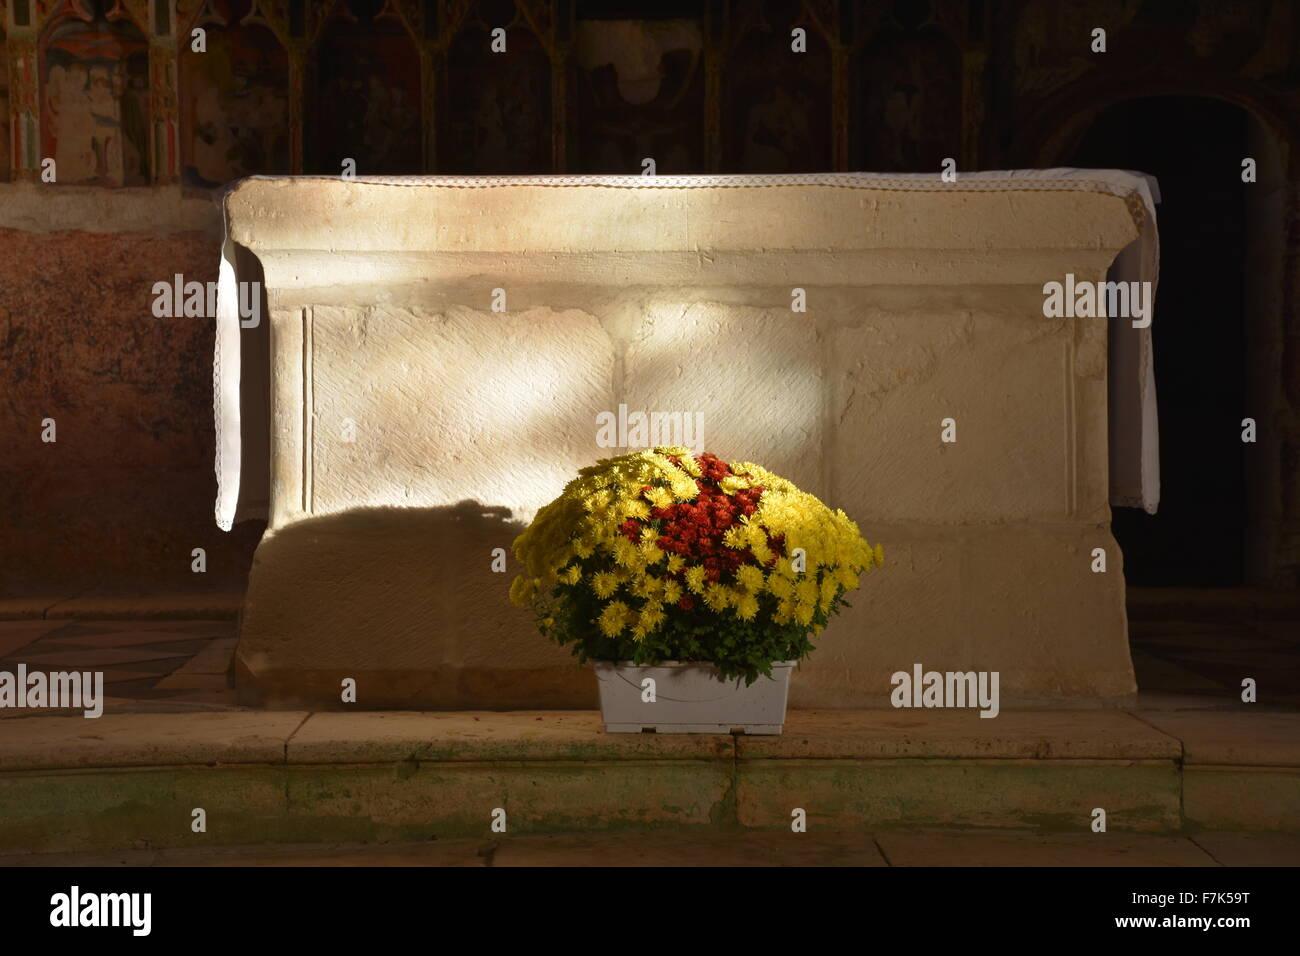 Altar, Aubdignon church, Landes, France - Stock Image